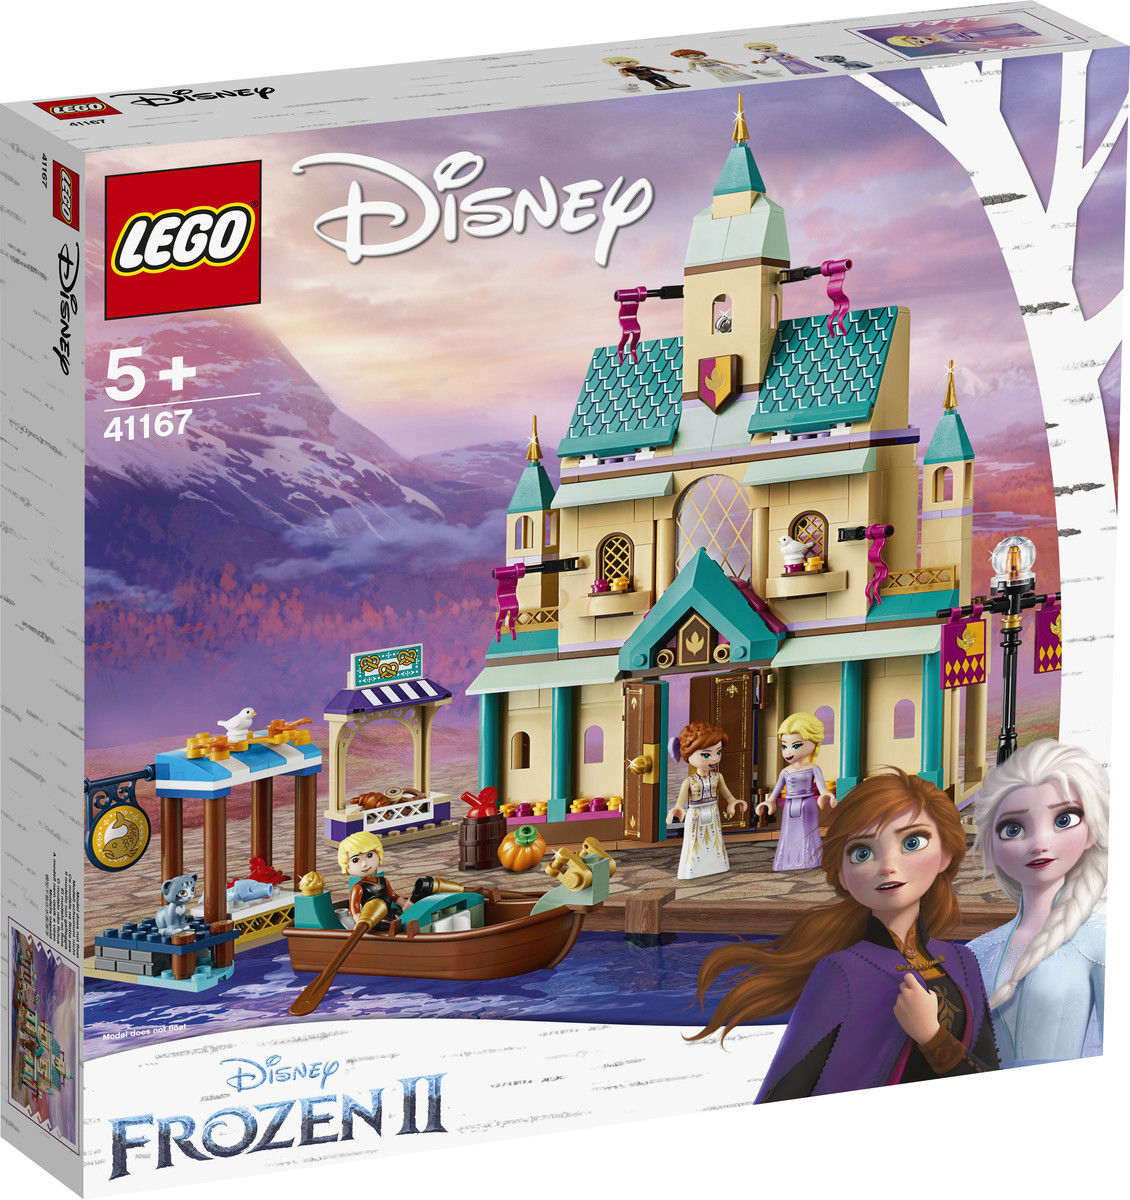 LEGO Disney Princess Zamkowa wioska w Arendelle 41167